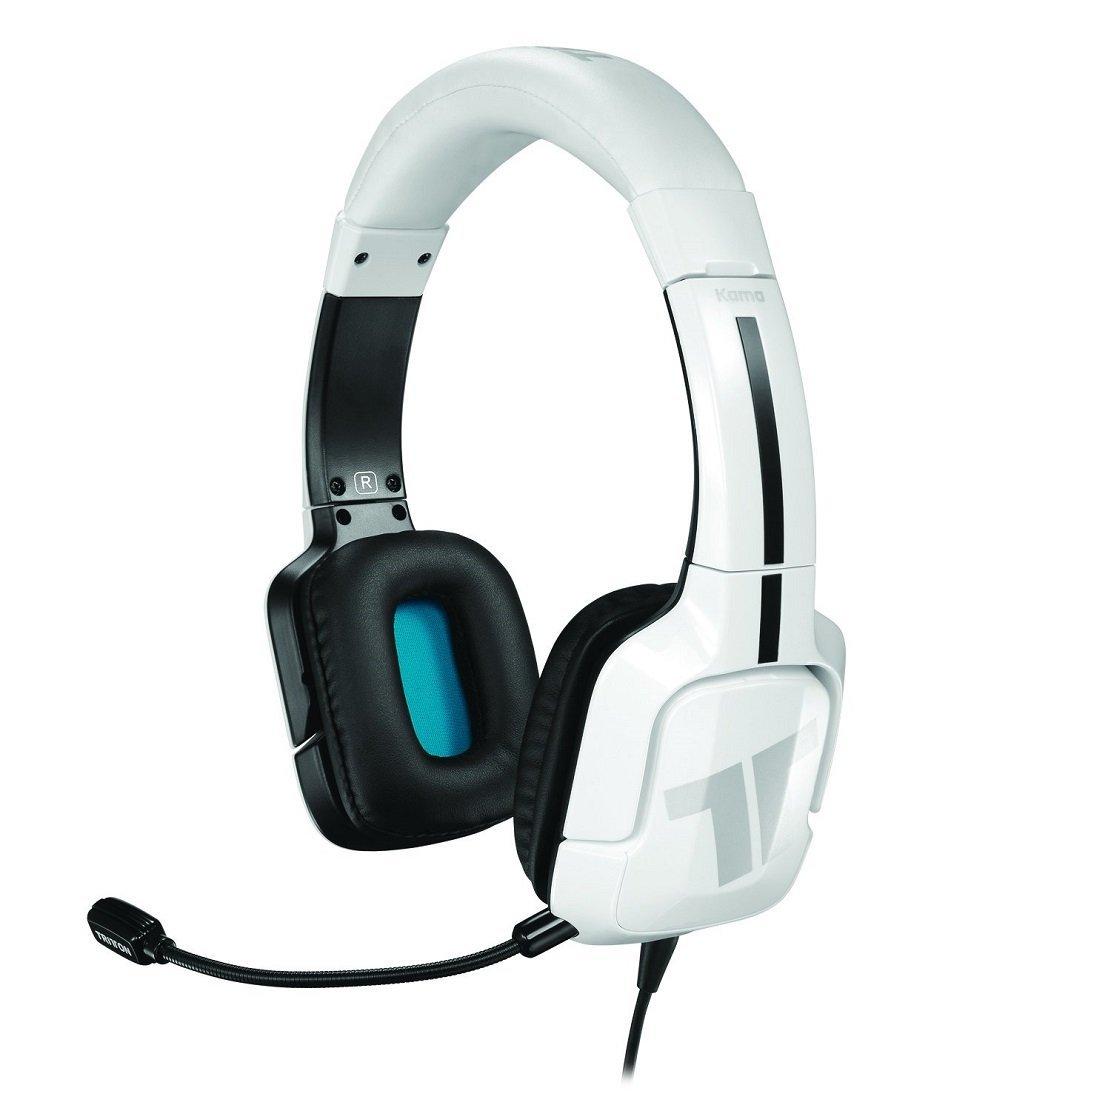 Tritton Kama Stereo Headset, weiß